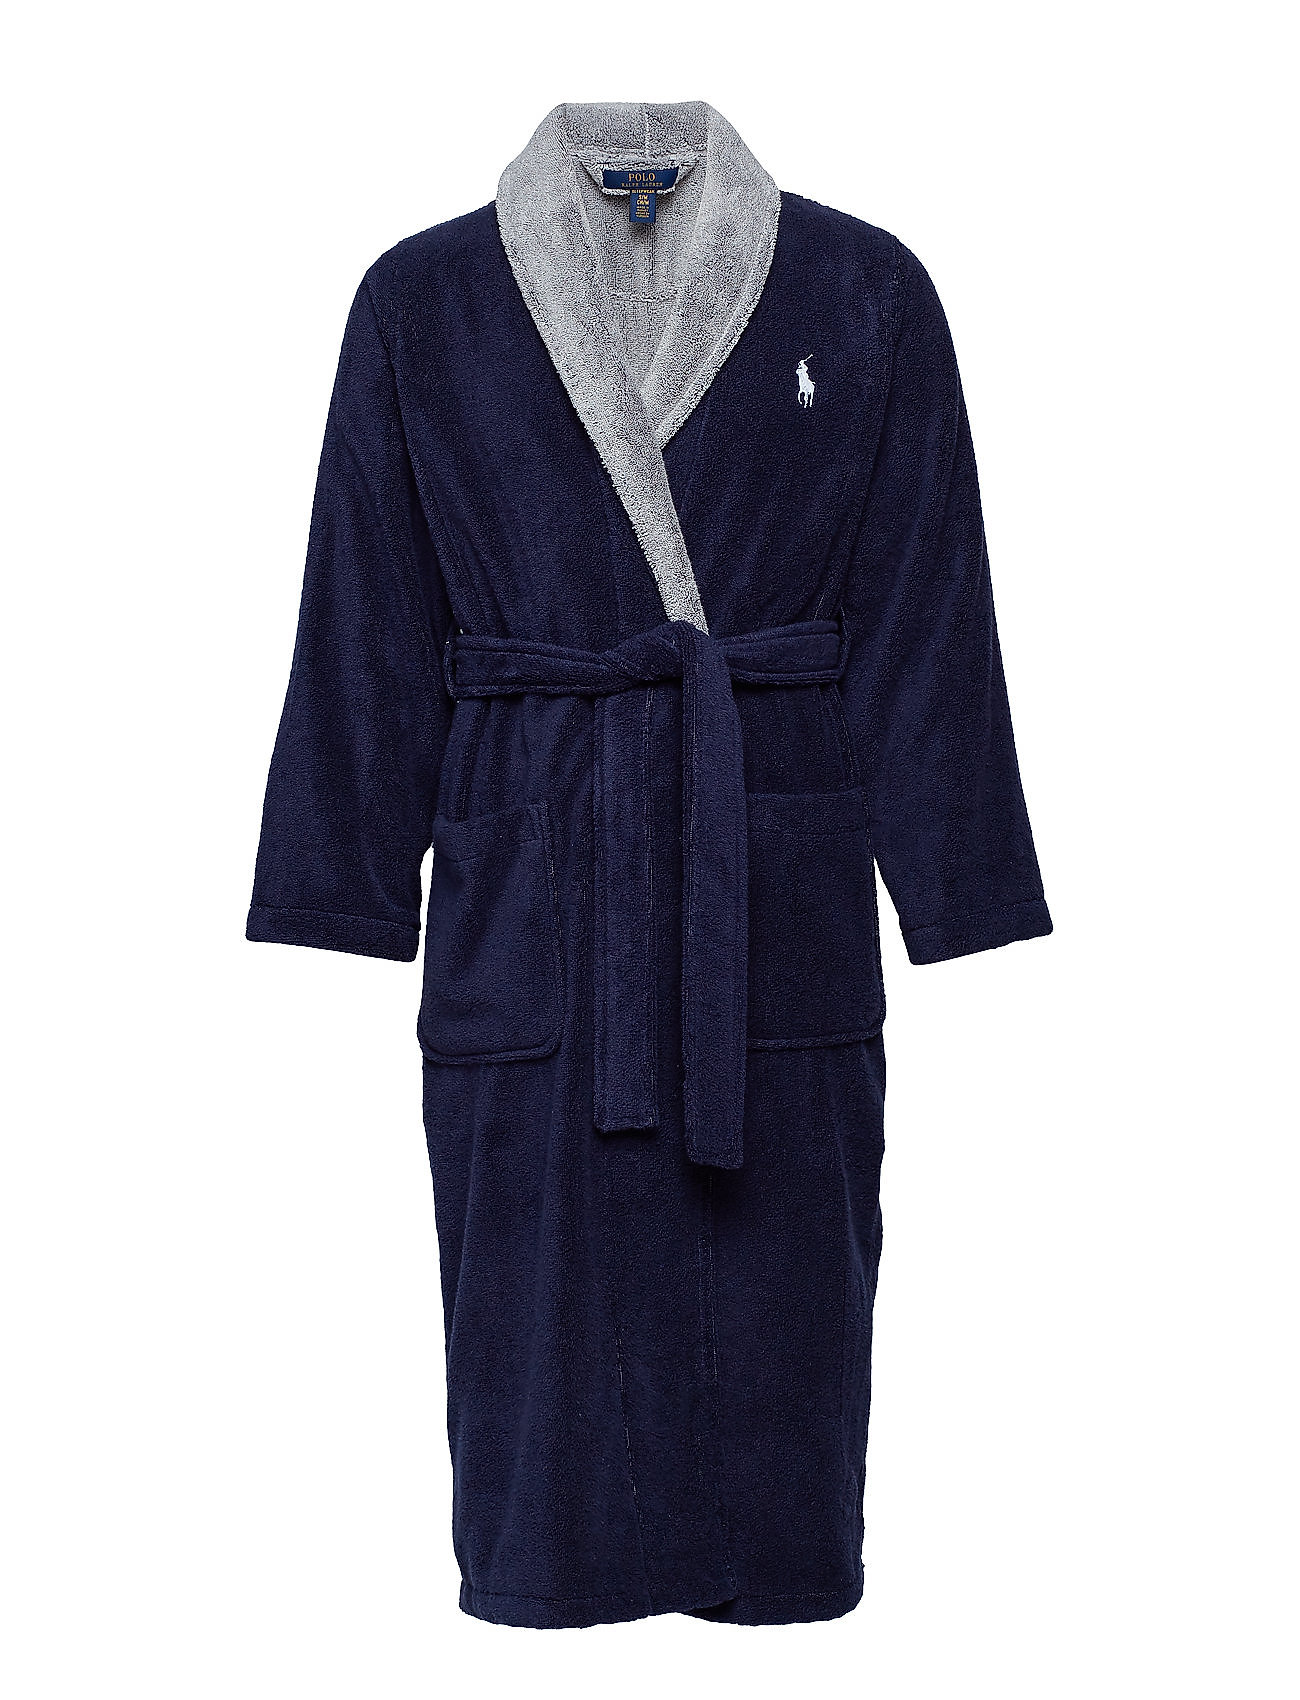 Polo Ralph Lauren Underwear LTWT TERRY JACQUARD-RBE